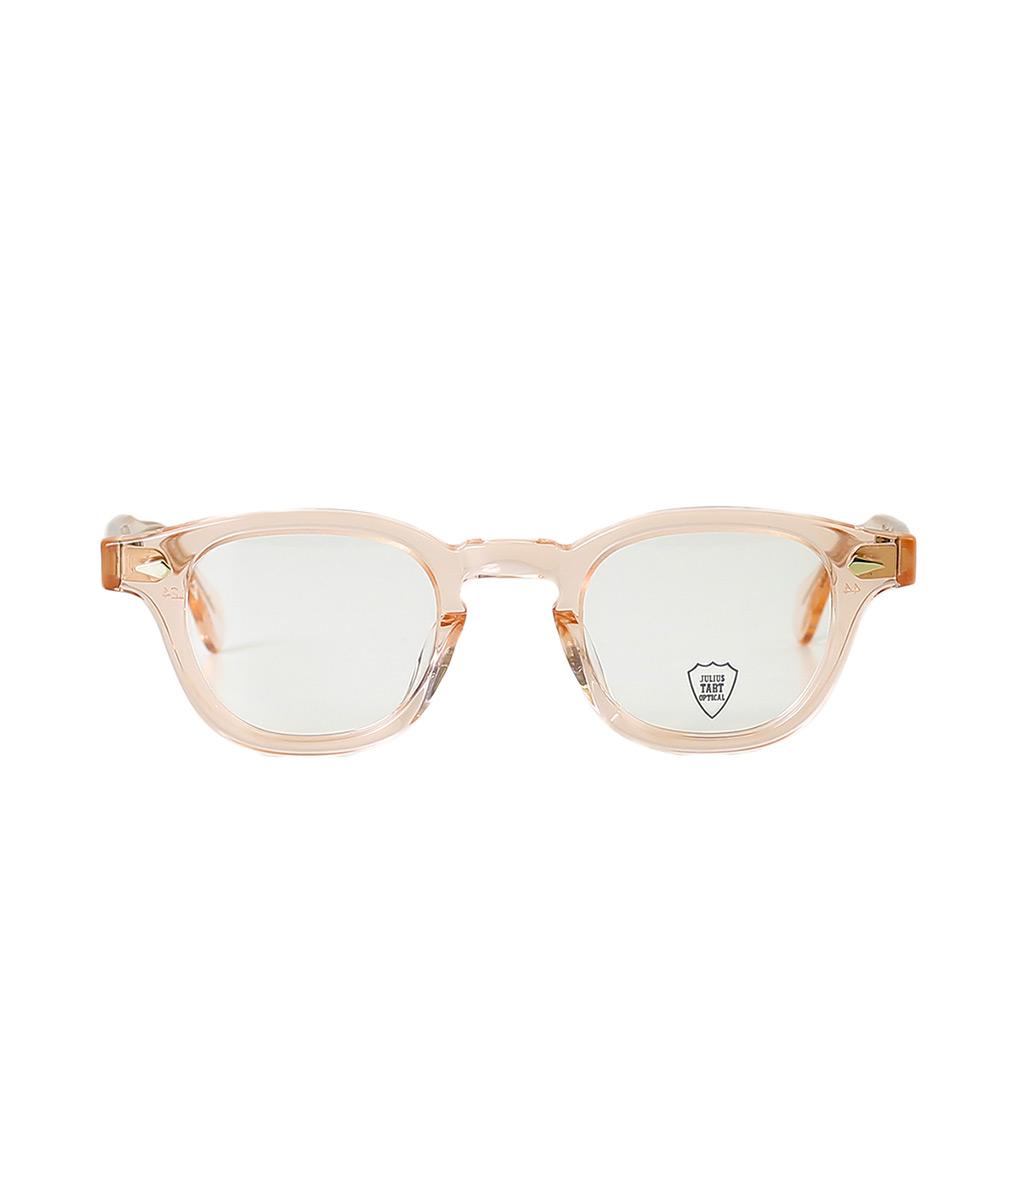 JULIUS TART OPTICAL / ジュリアスタートオプティカル : AR 44 46-24 - FRESH PINK / CLEAR - : サングラス アクセサリー メガネ 眼鏡 : JTPL-101H-2H-wise【WIS】